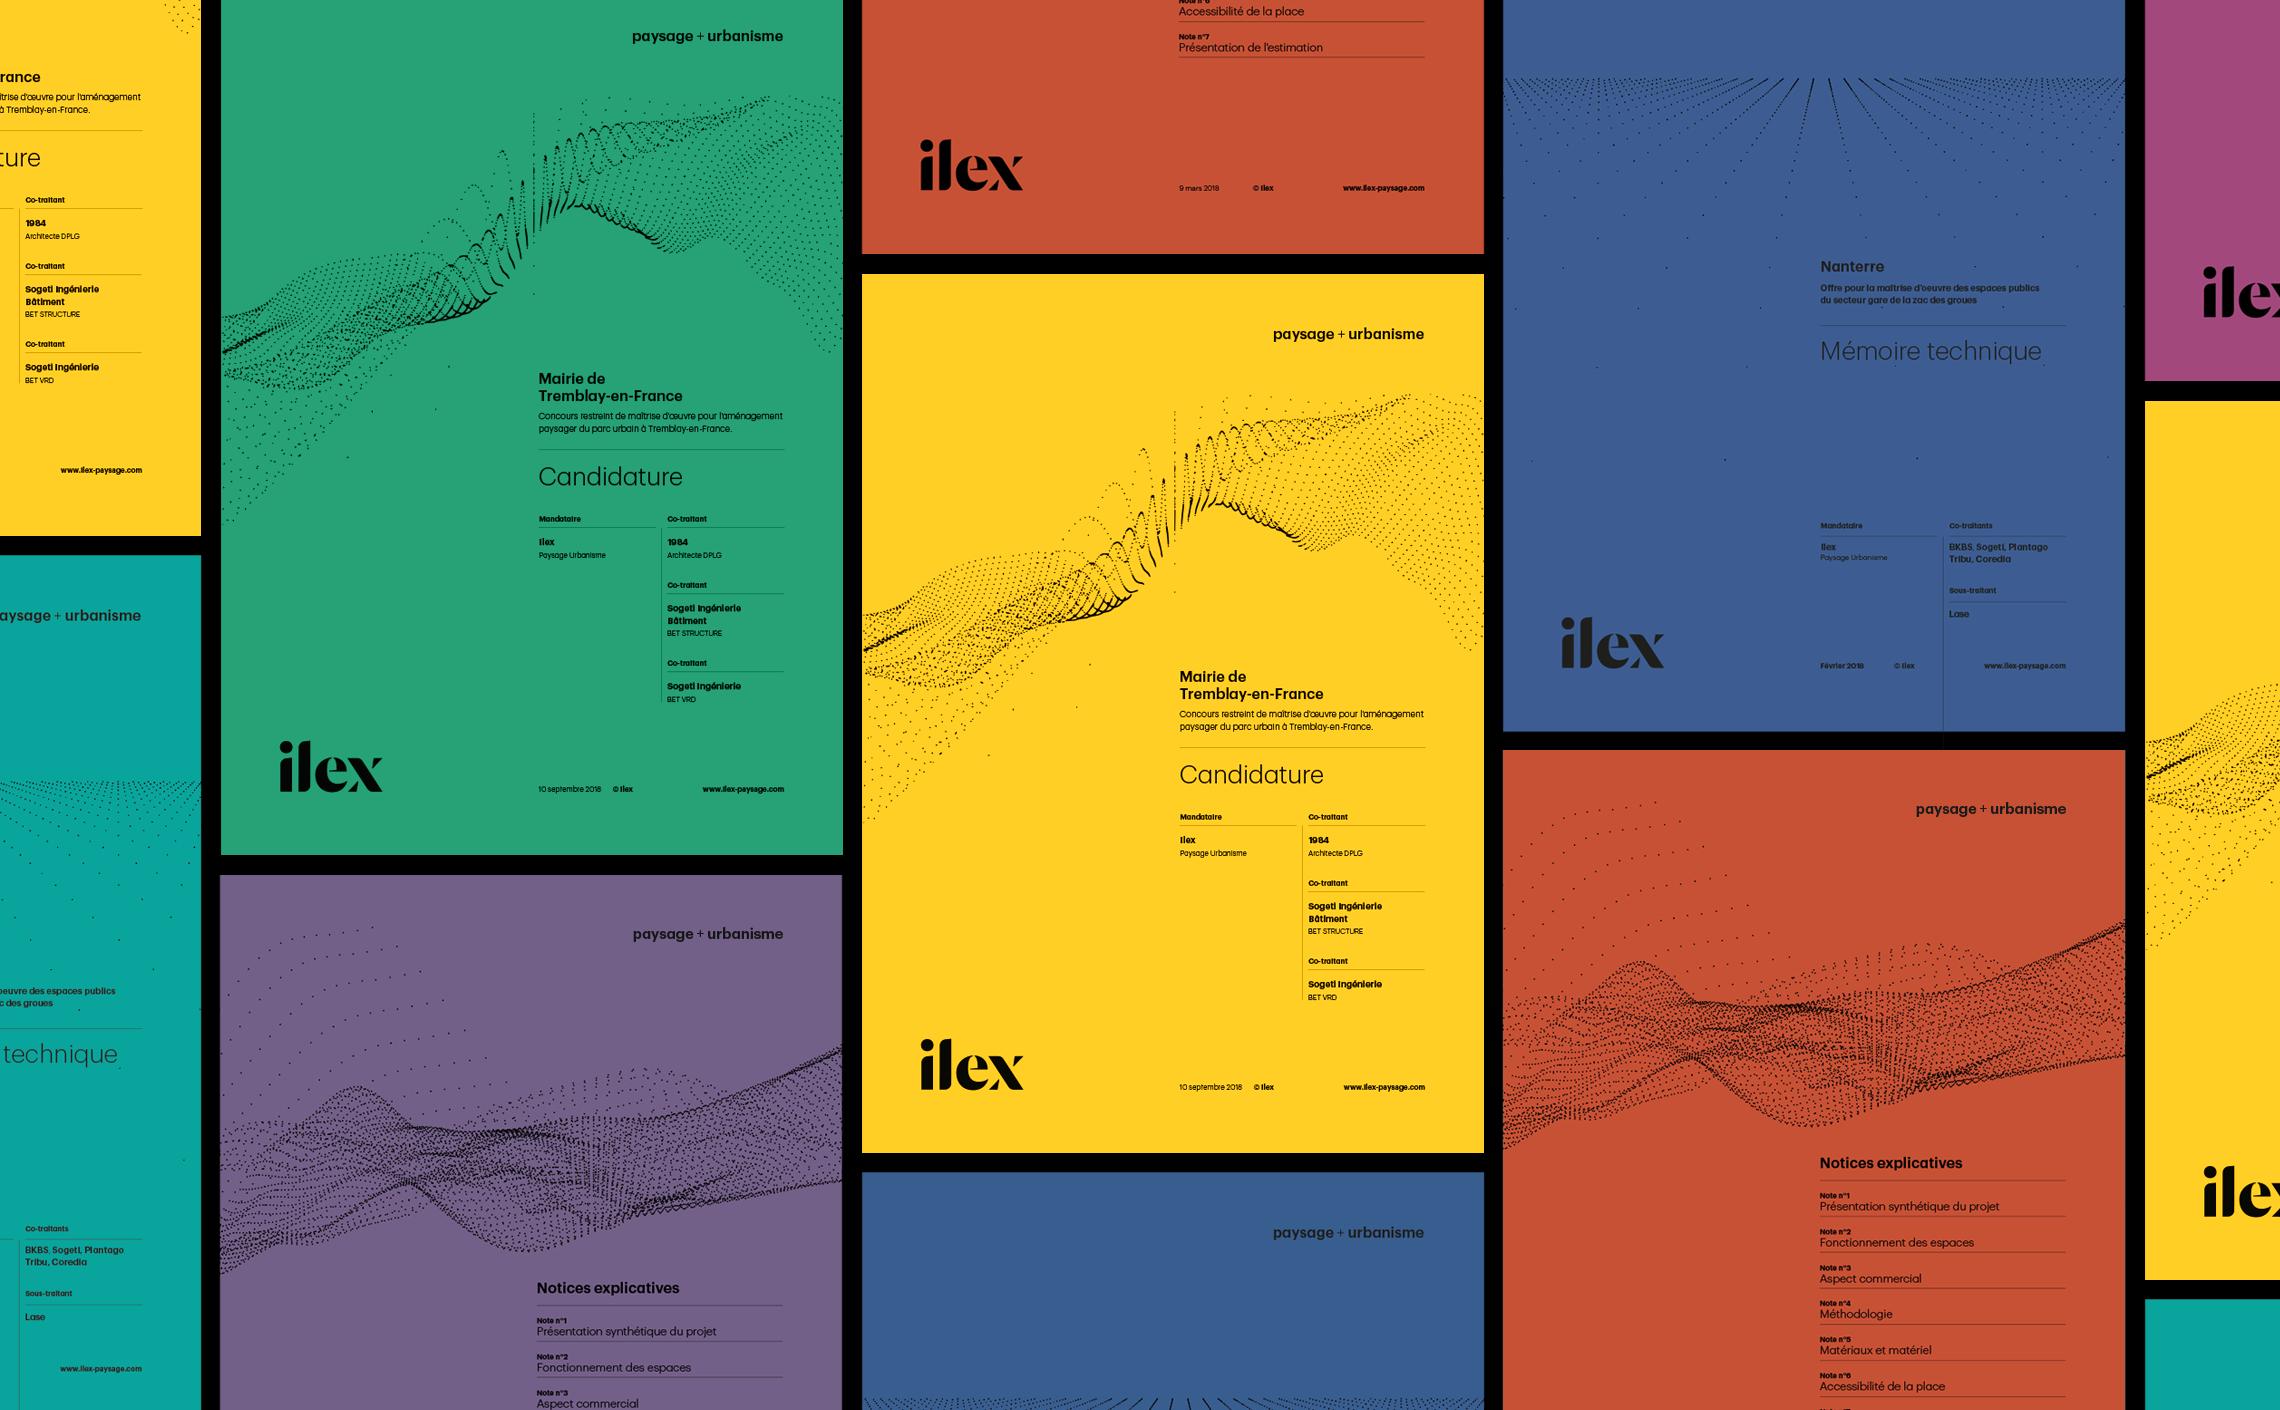 Ilex-images-web42